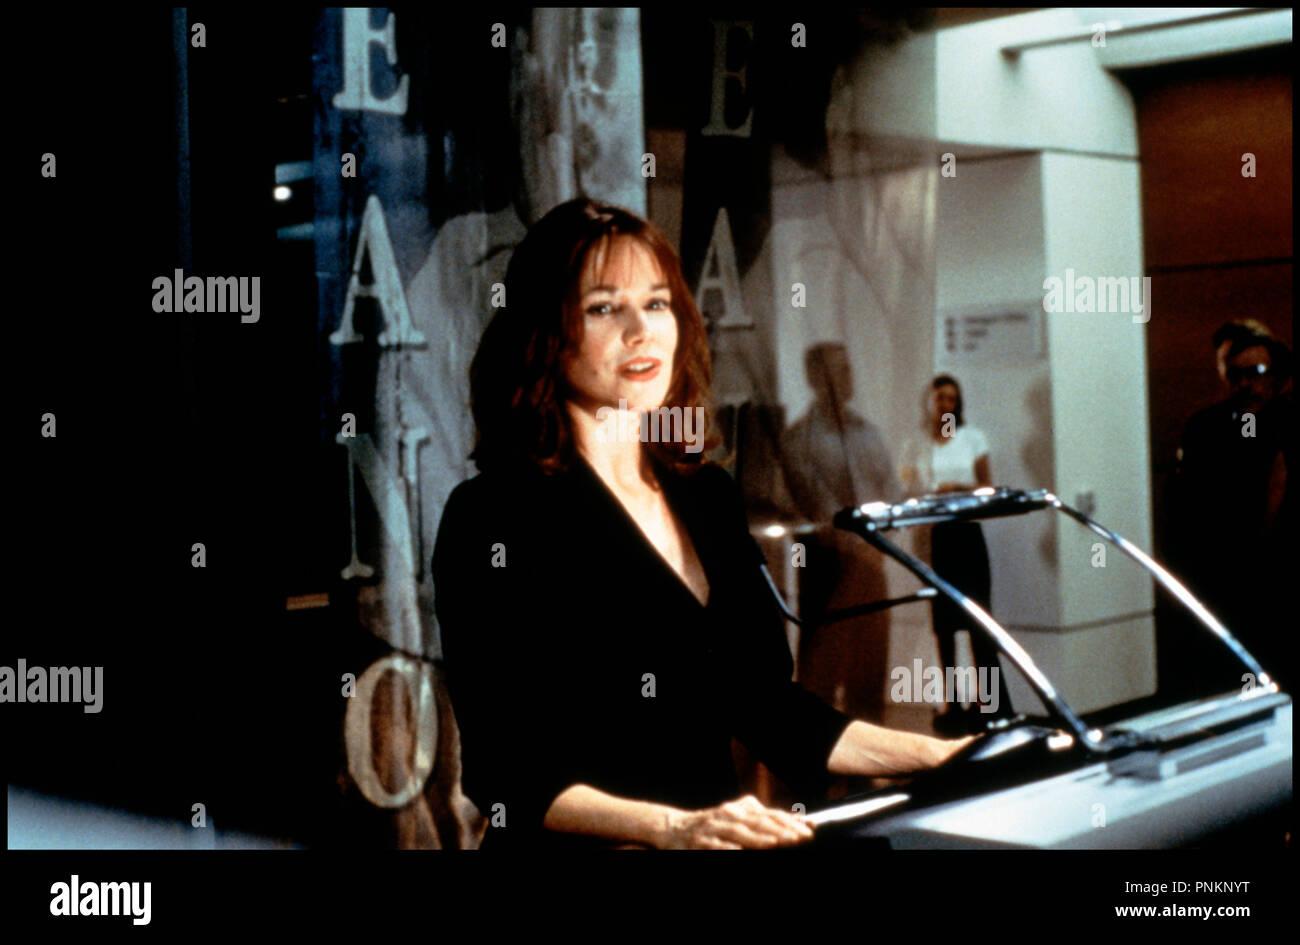 Prod DB © Jan Chapman - BMP / DR LANTANA (LANTANA) de Ray Lawrence 2001 USA avec Barbara Hershey d'apres la piece de Andrew Bovell Stock Photo